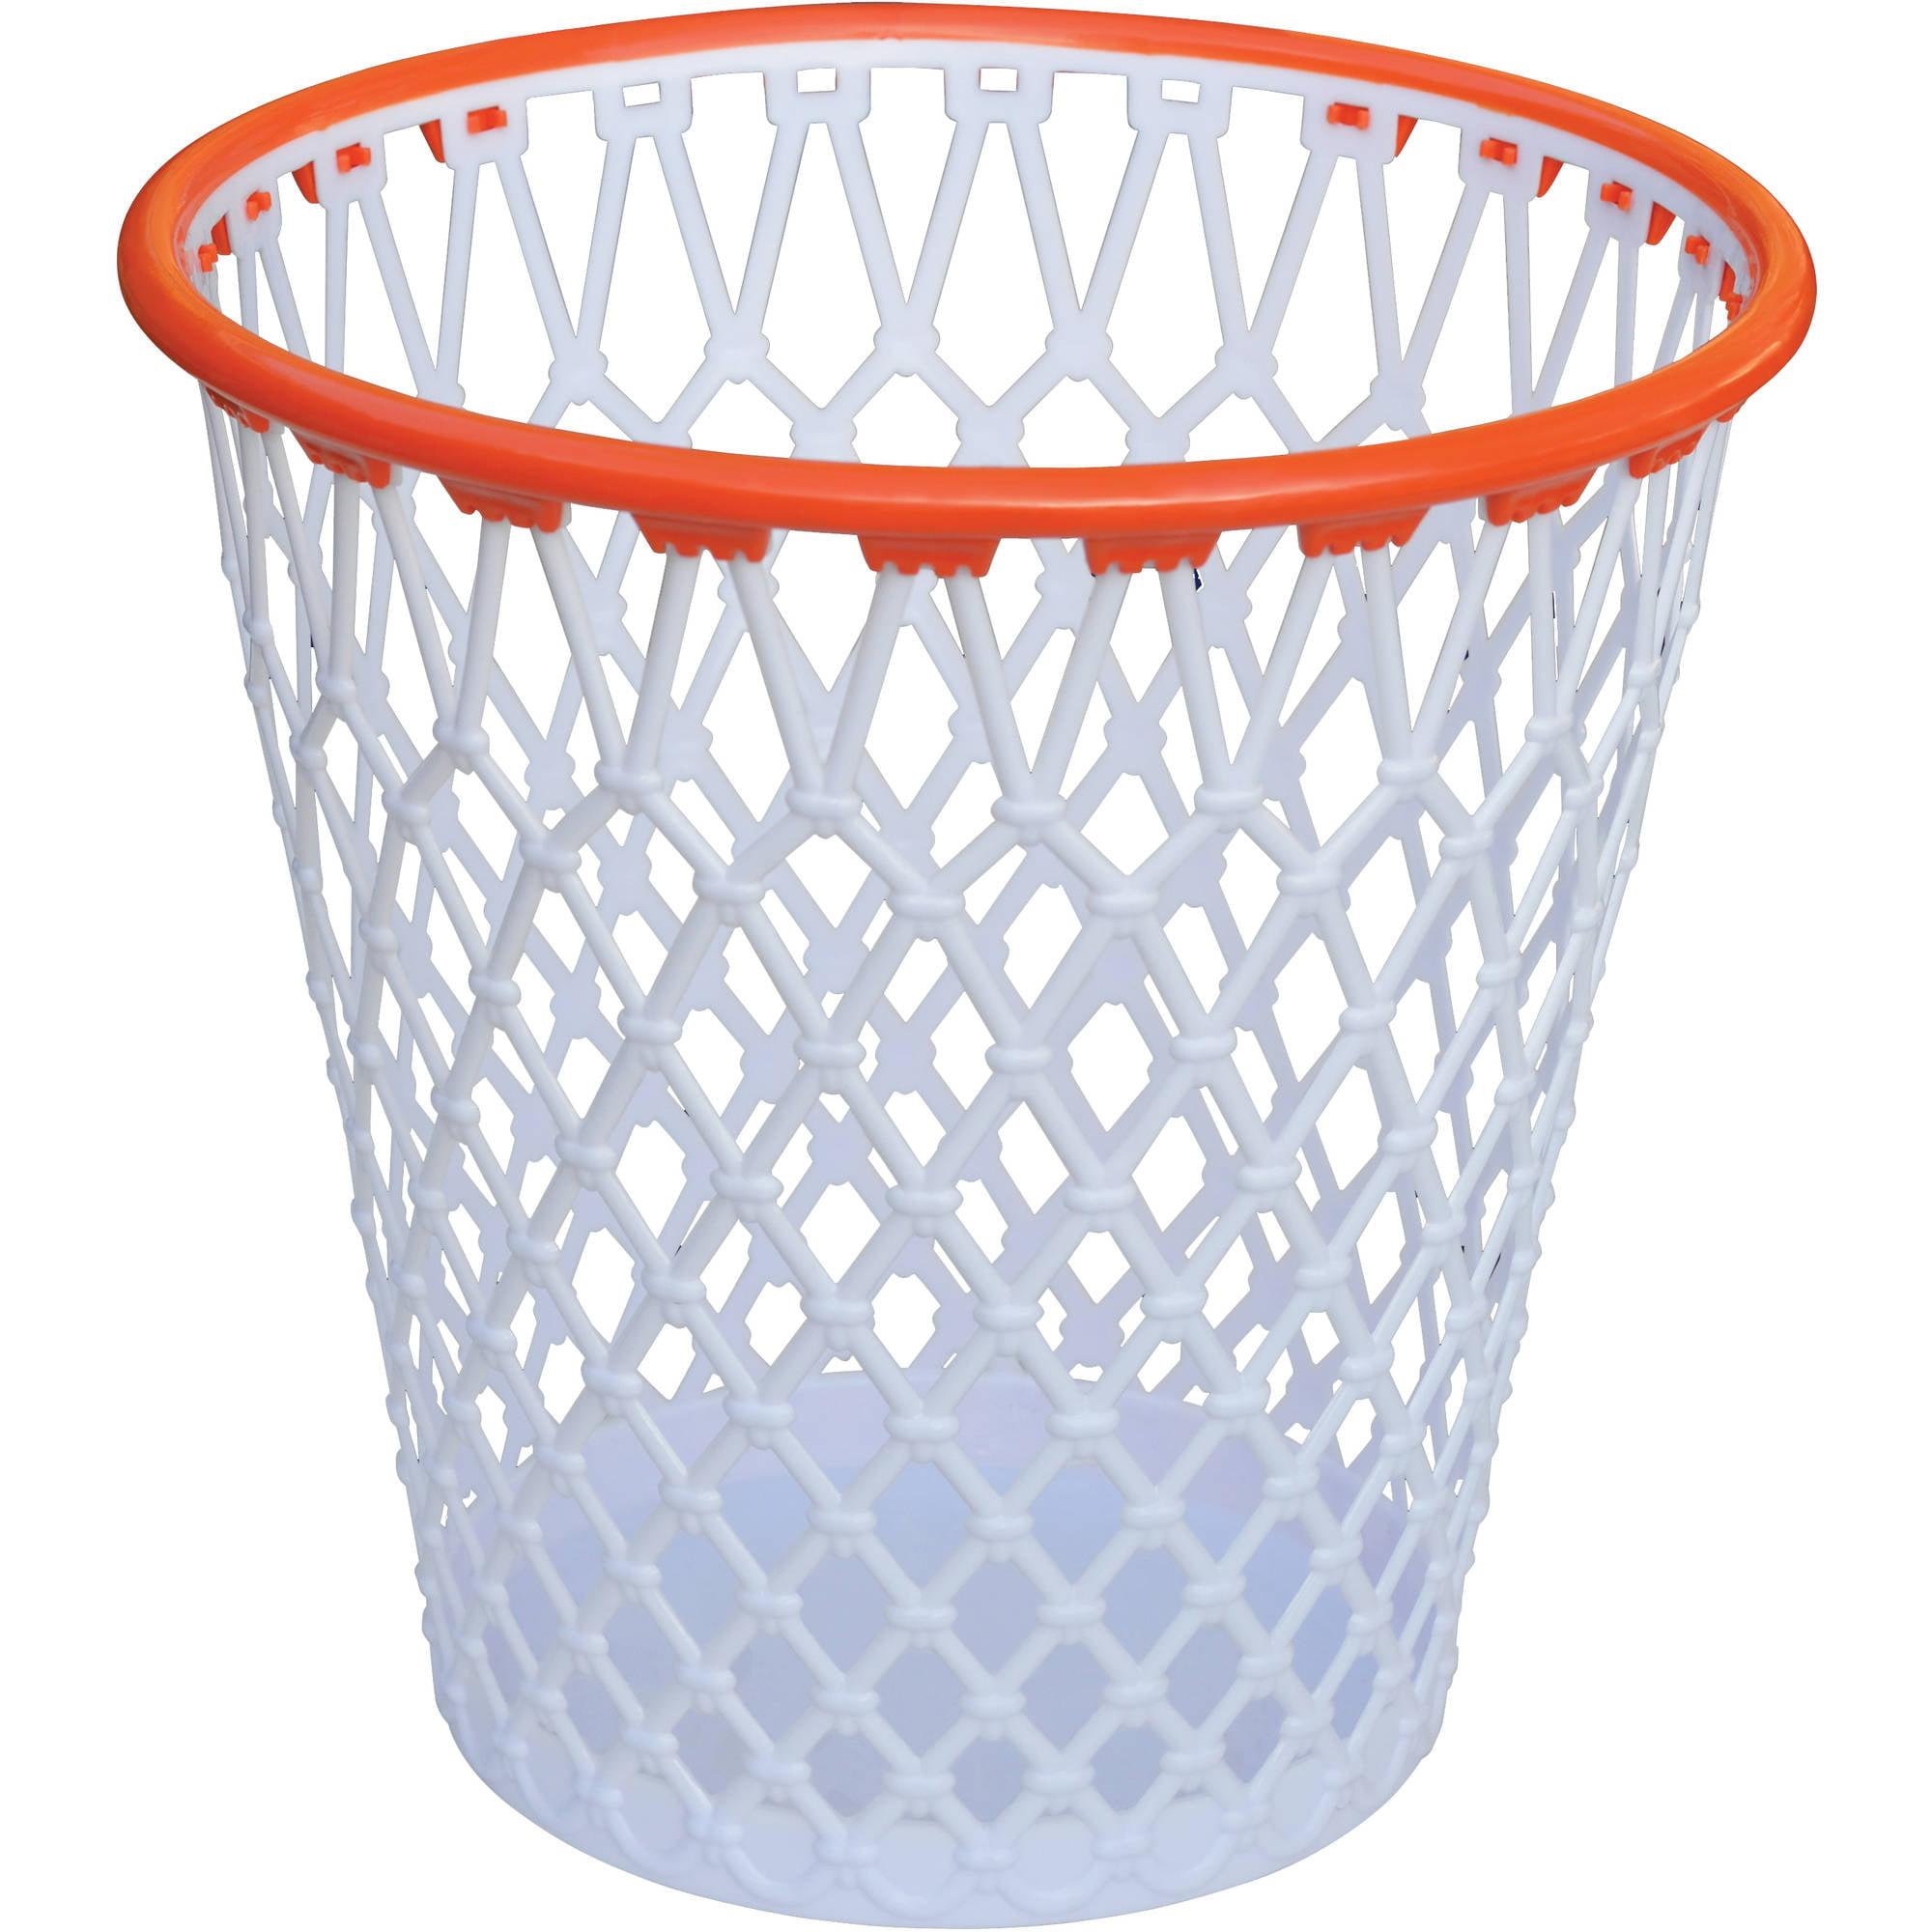 Spalding Hoopster Wastepaper Basket